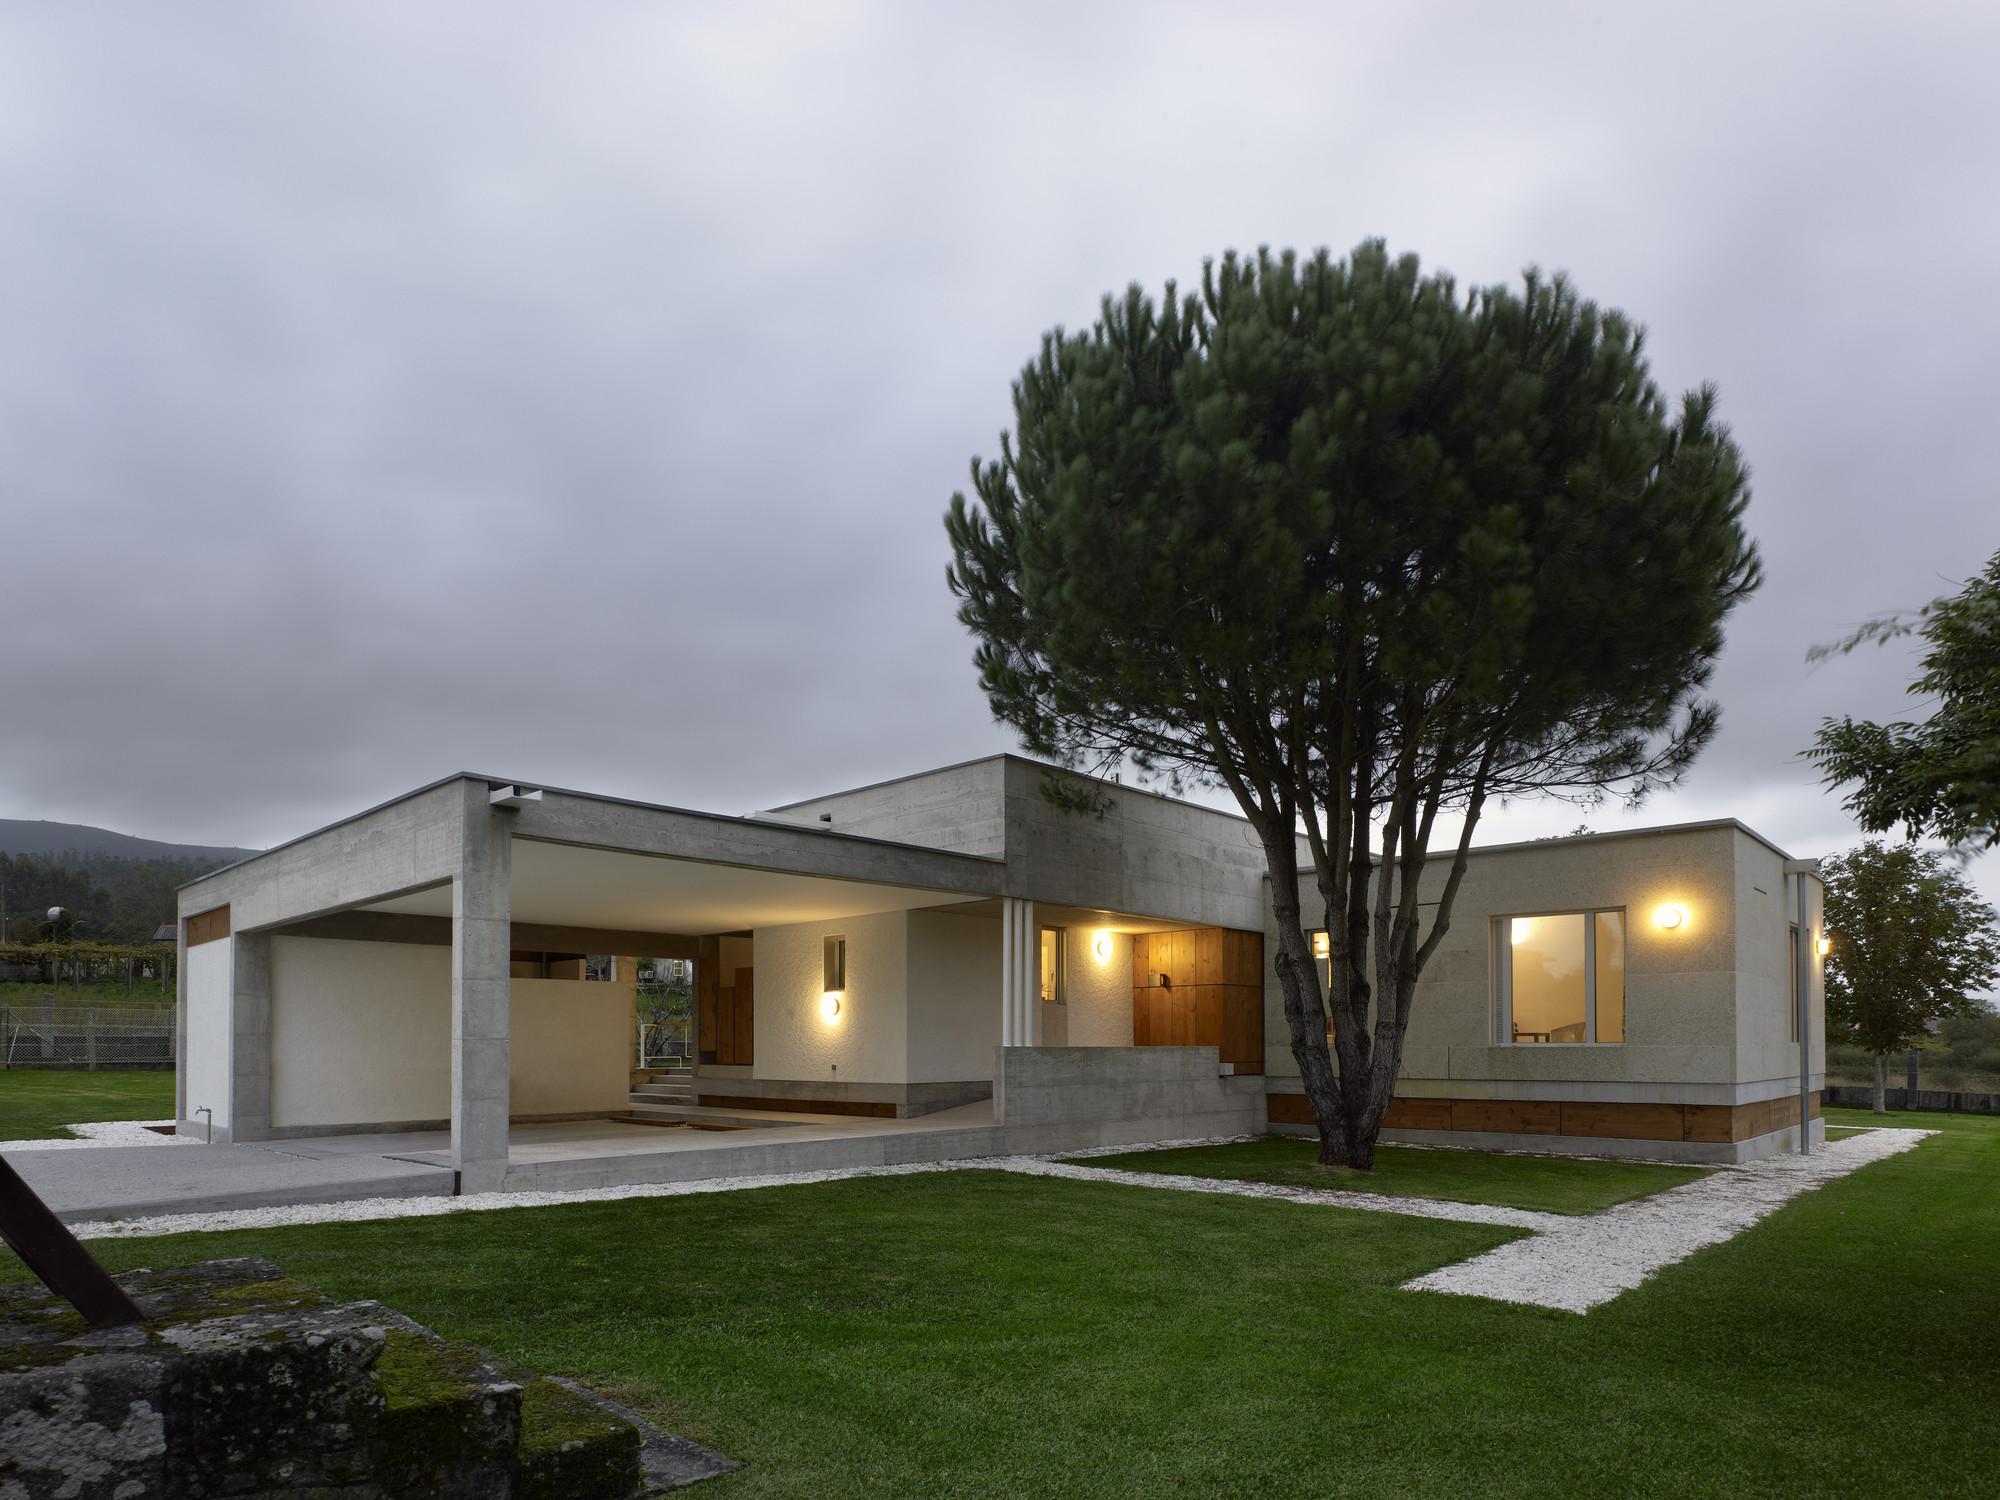 Casa de f tima salgado e li ares arquitectos - Casas prefabricadas a coruna ...